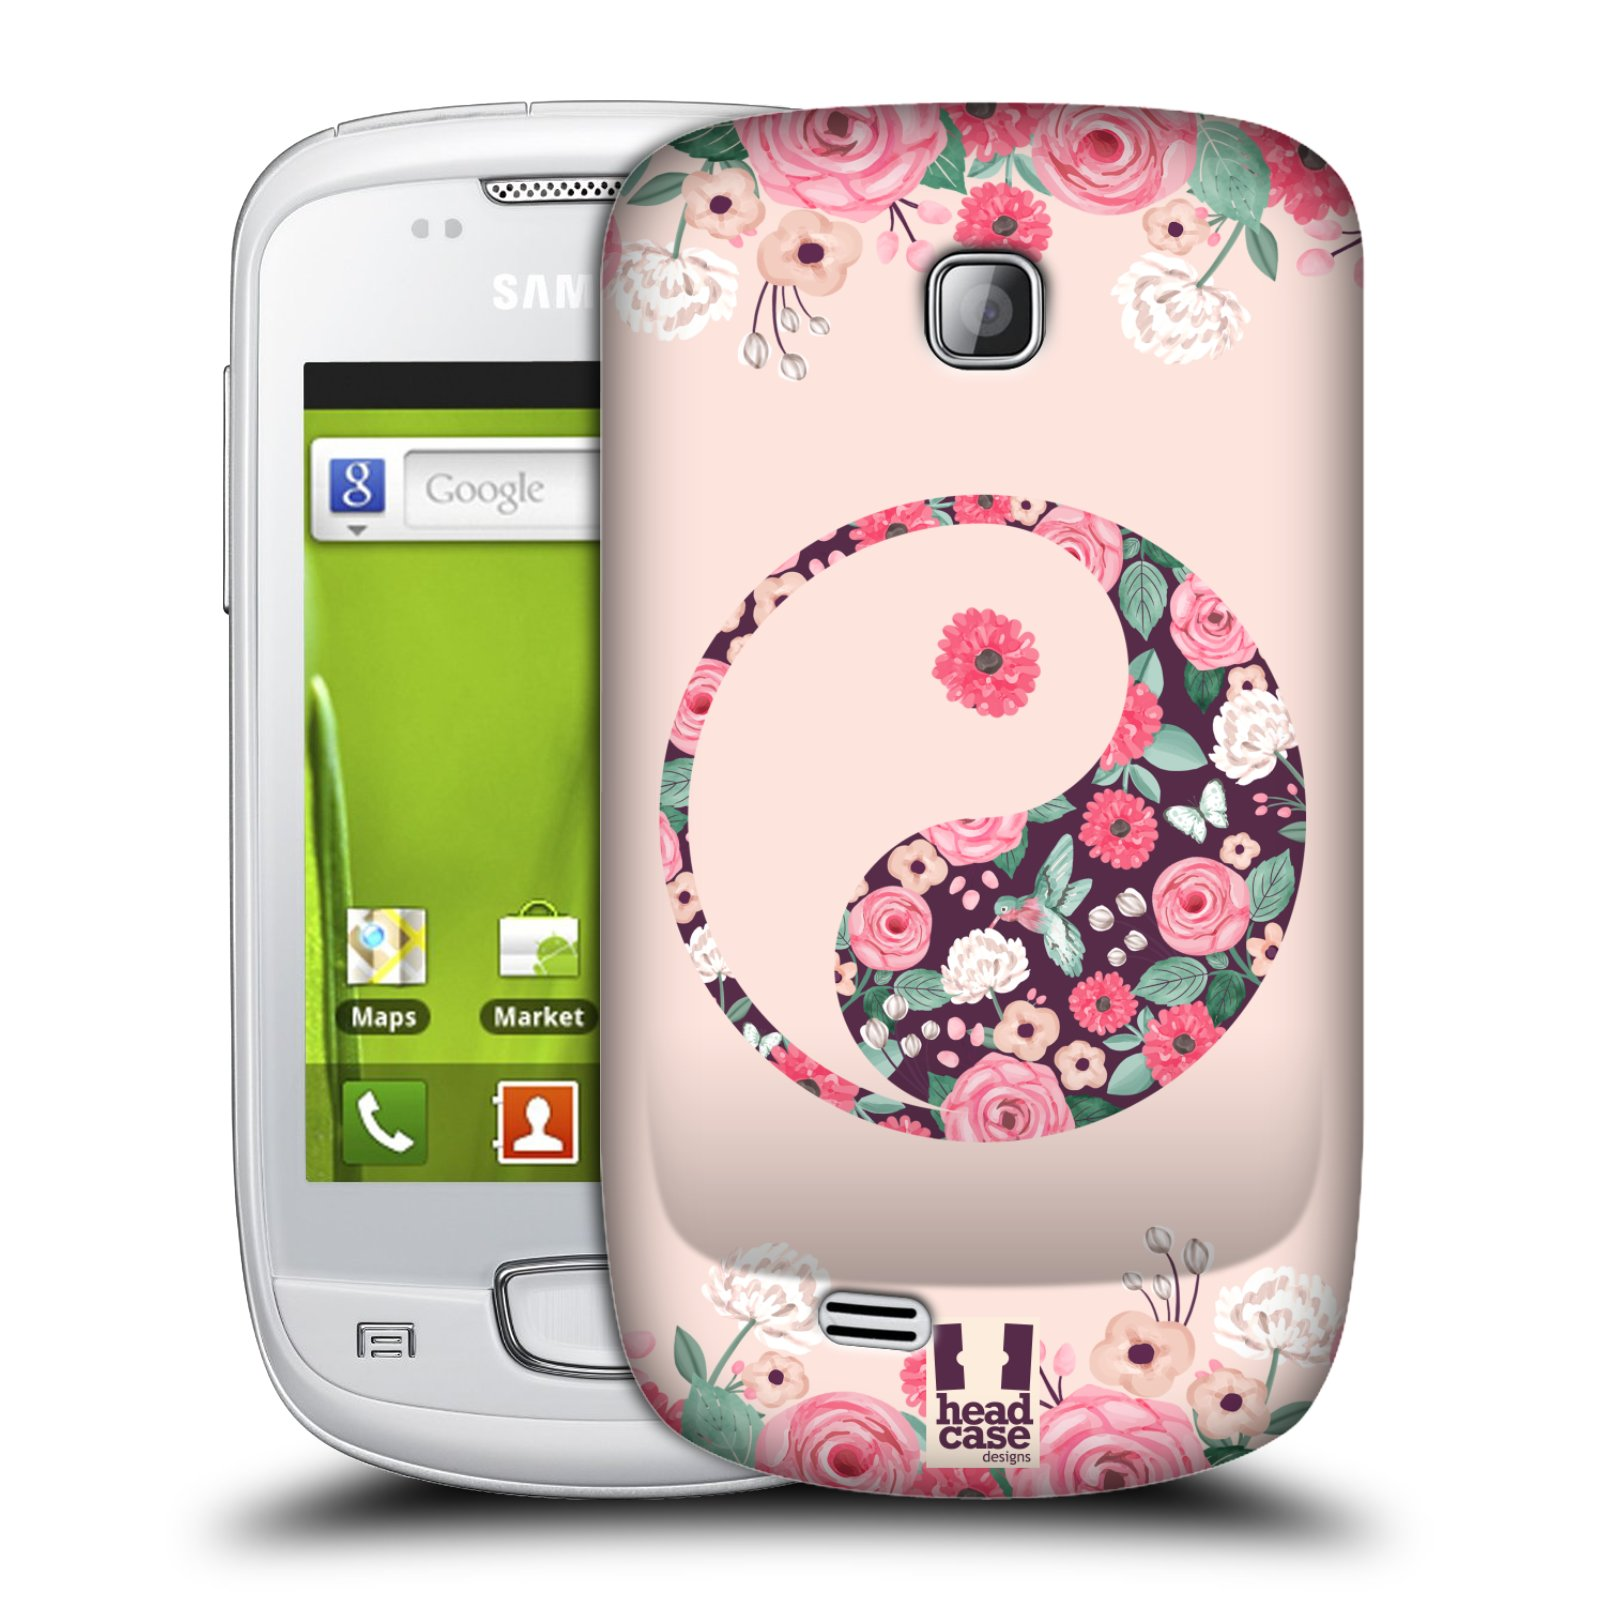 Plastové pouzdro na mobil Samsung Galaxy Mini HEAD CASE Yin a Yang Floral (Kryt či obal na mobilní telefon Samsung Galaxy Mini GT-S5570 / GT-S5570i)